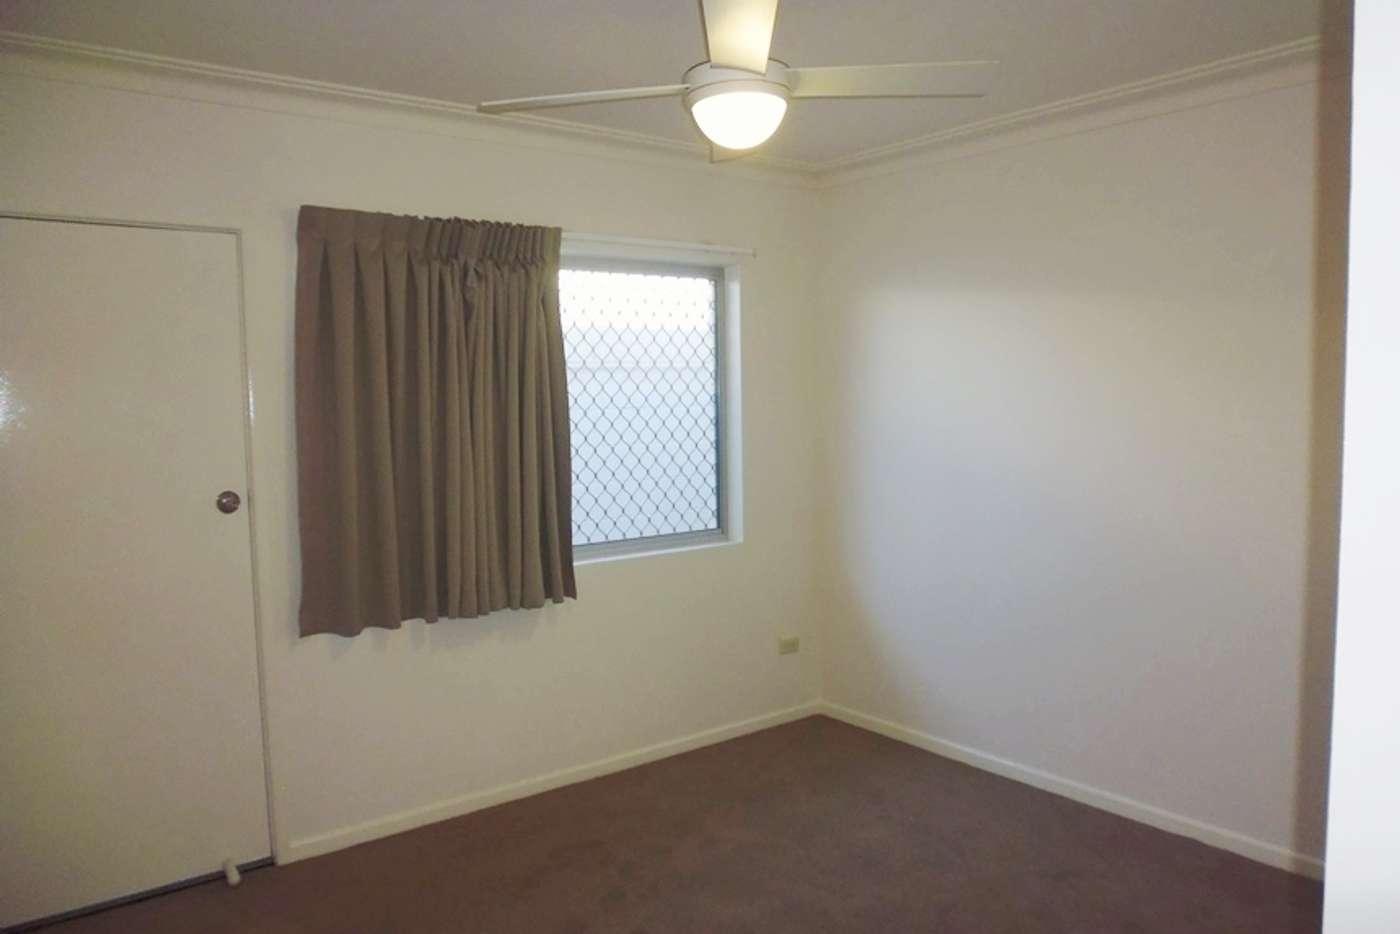 Sixth view of Homely unit listing, 2/10 Adori Street, Chevron Island QLD 4217